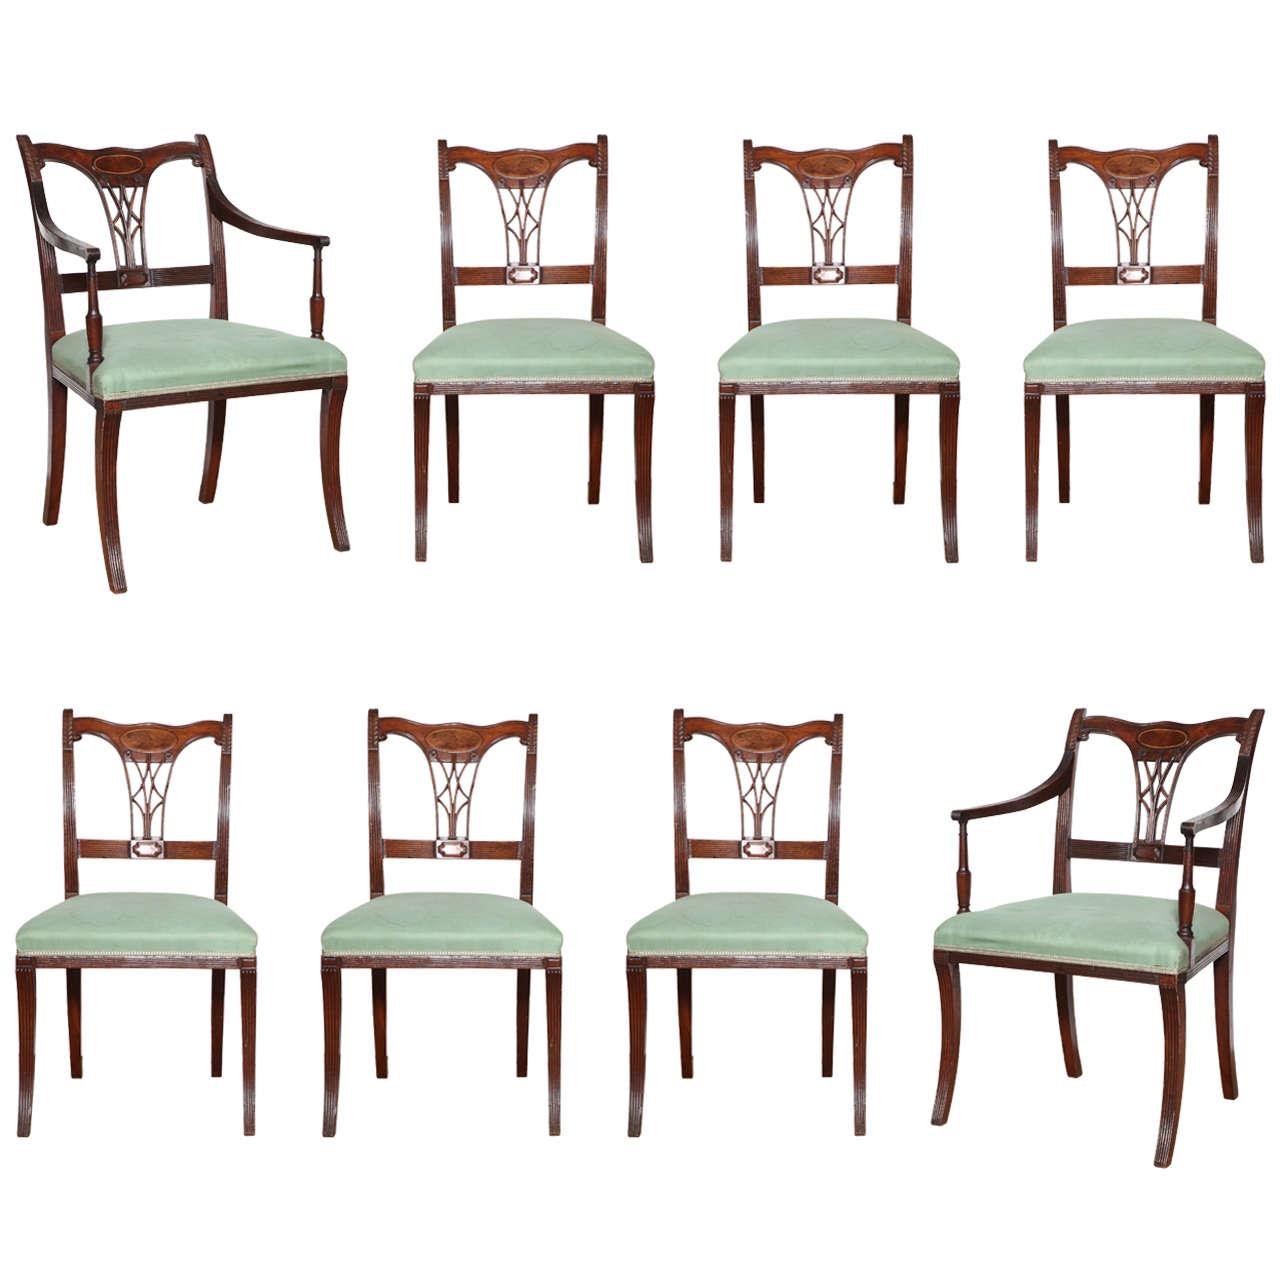 Set of Eight Early 19th Century Irish Regency Mahogany Dining Chairs